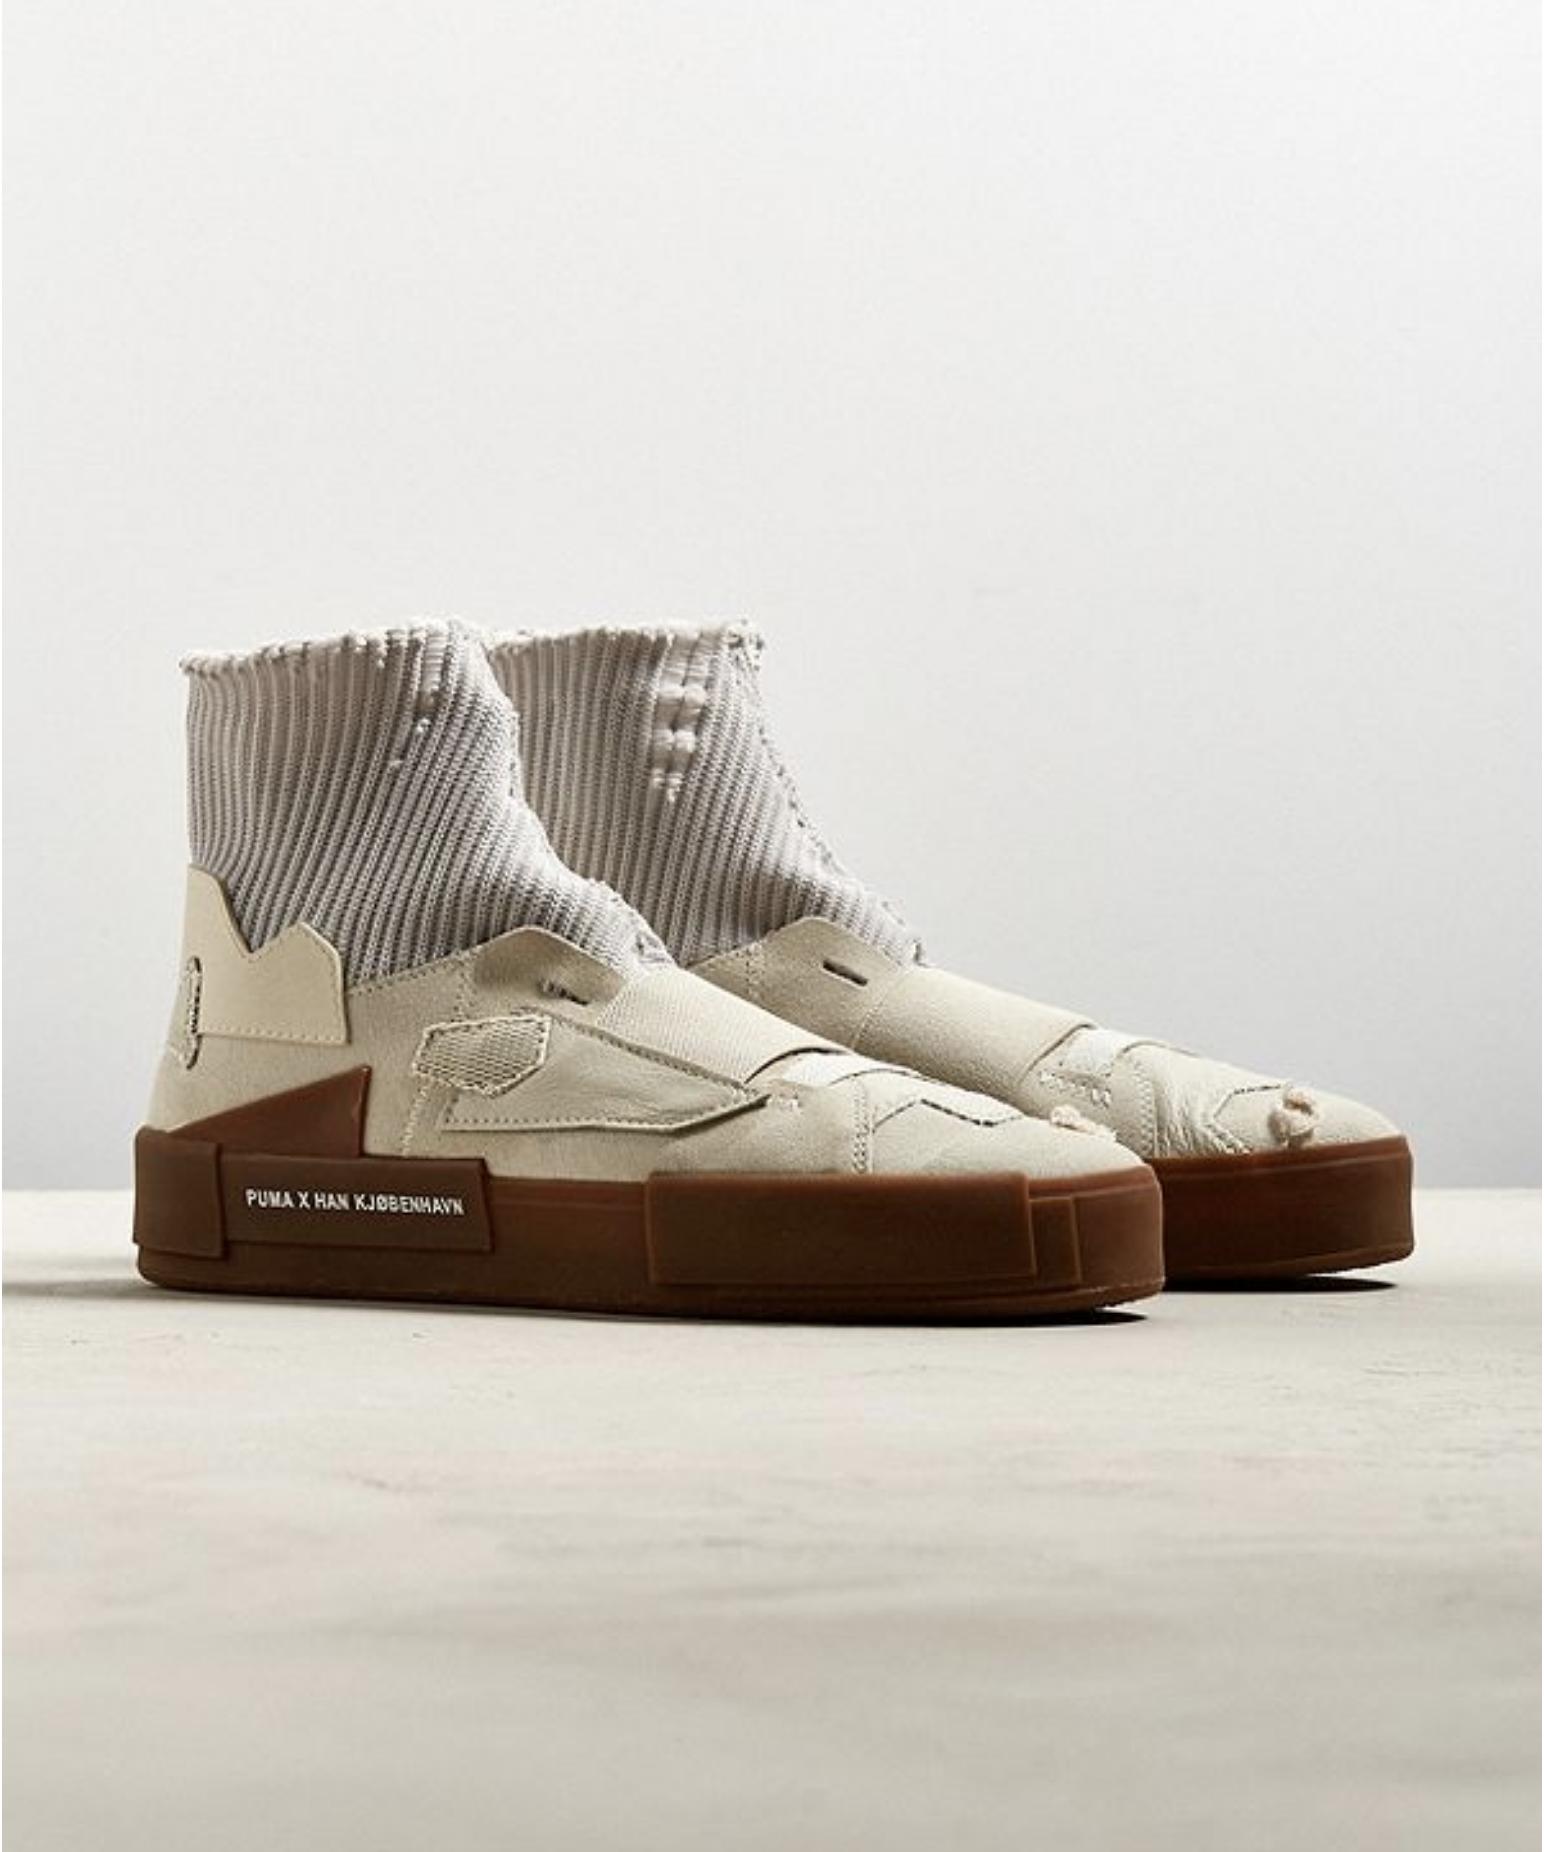 Puma X Han Kjobenhavn Court Platform Sneakers 140 Usd Sneakers Men Fashion Futuristic Shoes Mens Accessories Shoes